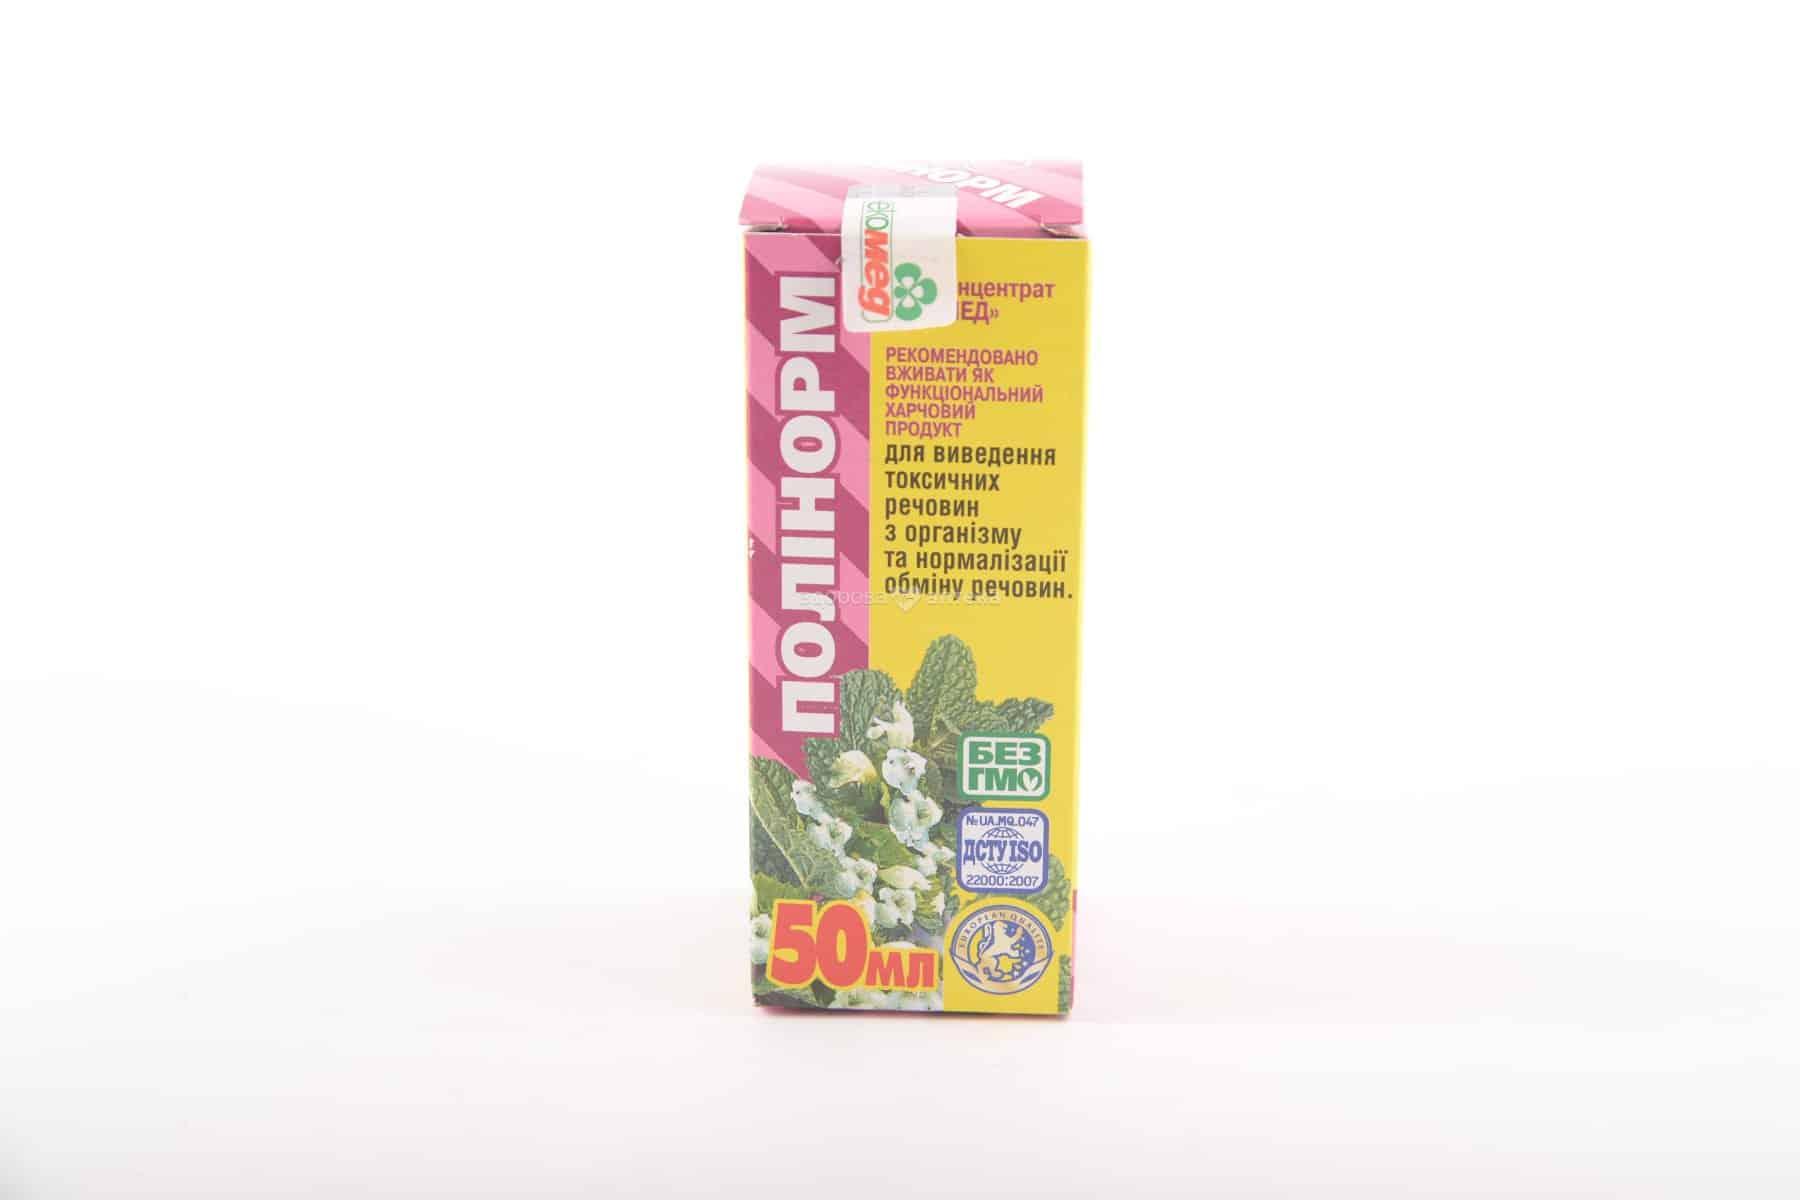 Polinorm 50 ml.